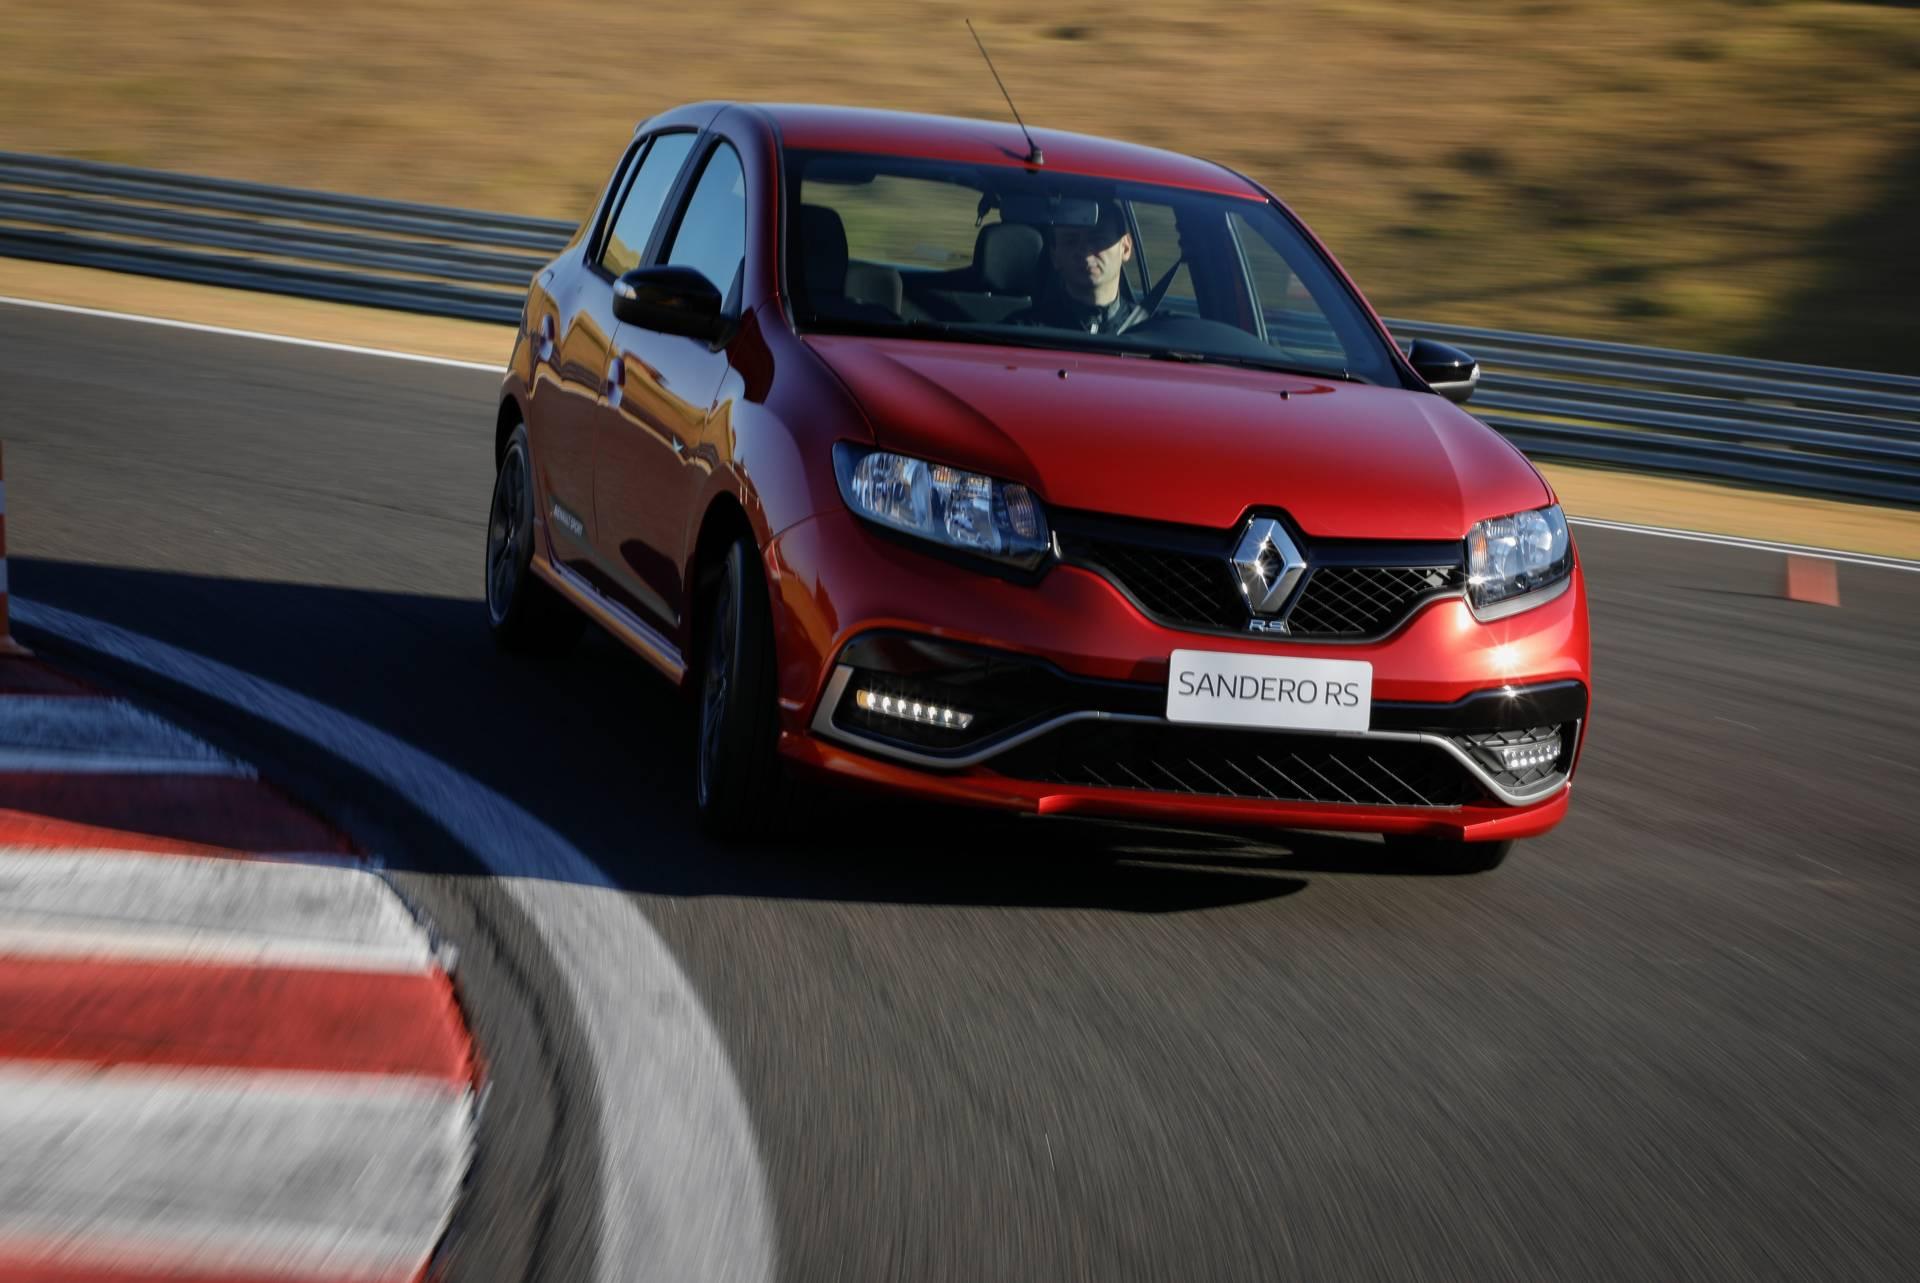 2020_Renault_Sandero_RS_facelift_0006